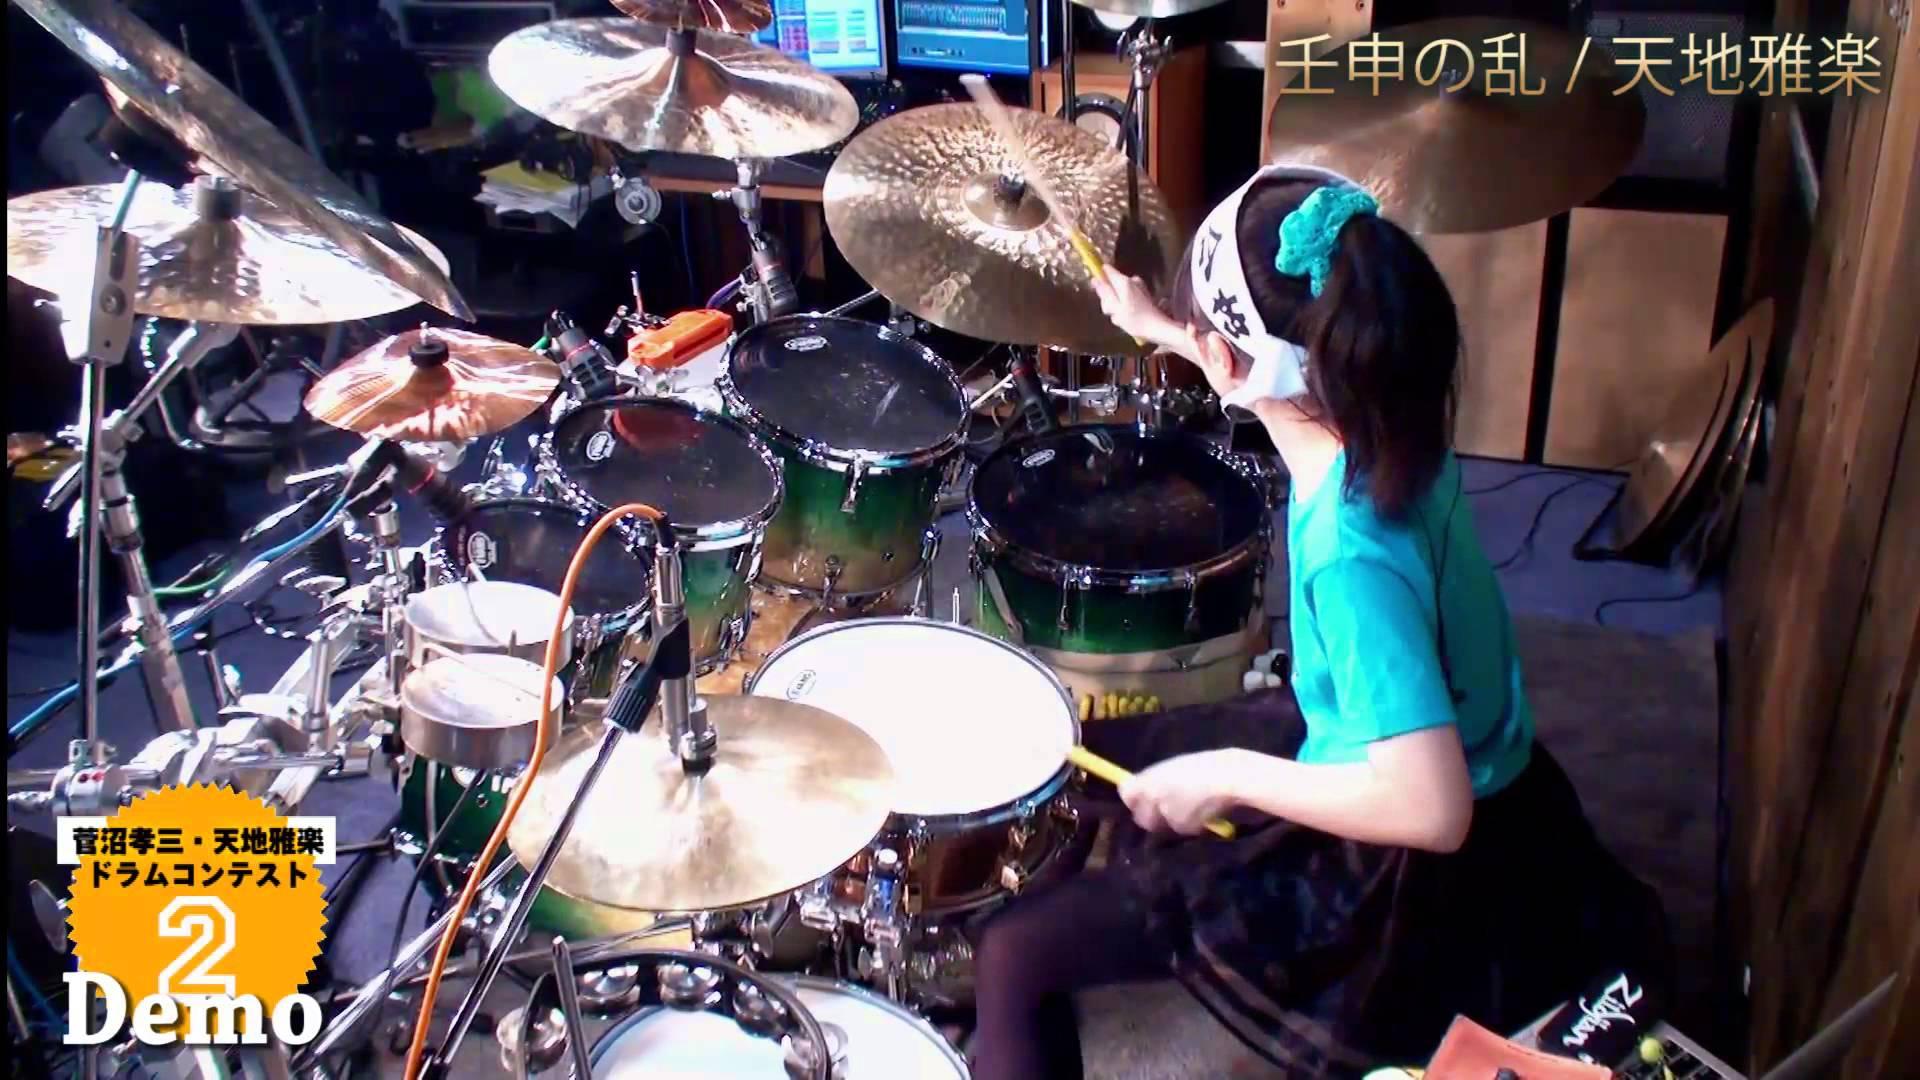 16-Year-Old Japanese Phenom Senri Kawaguchi Performs a Series of Impressive Drumming Feats